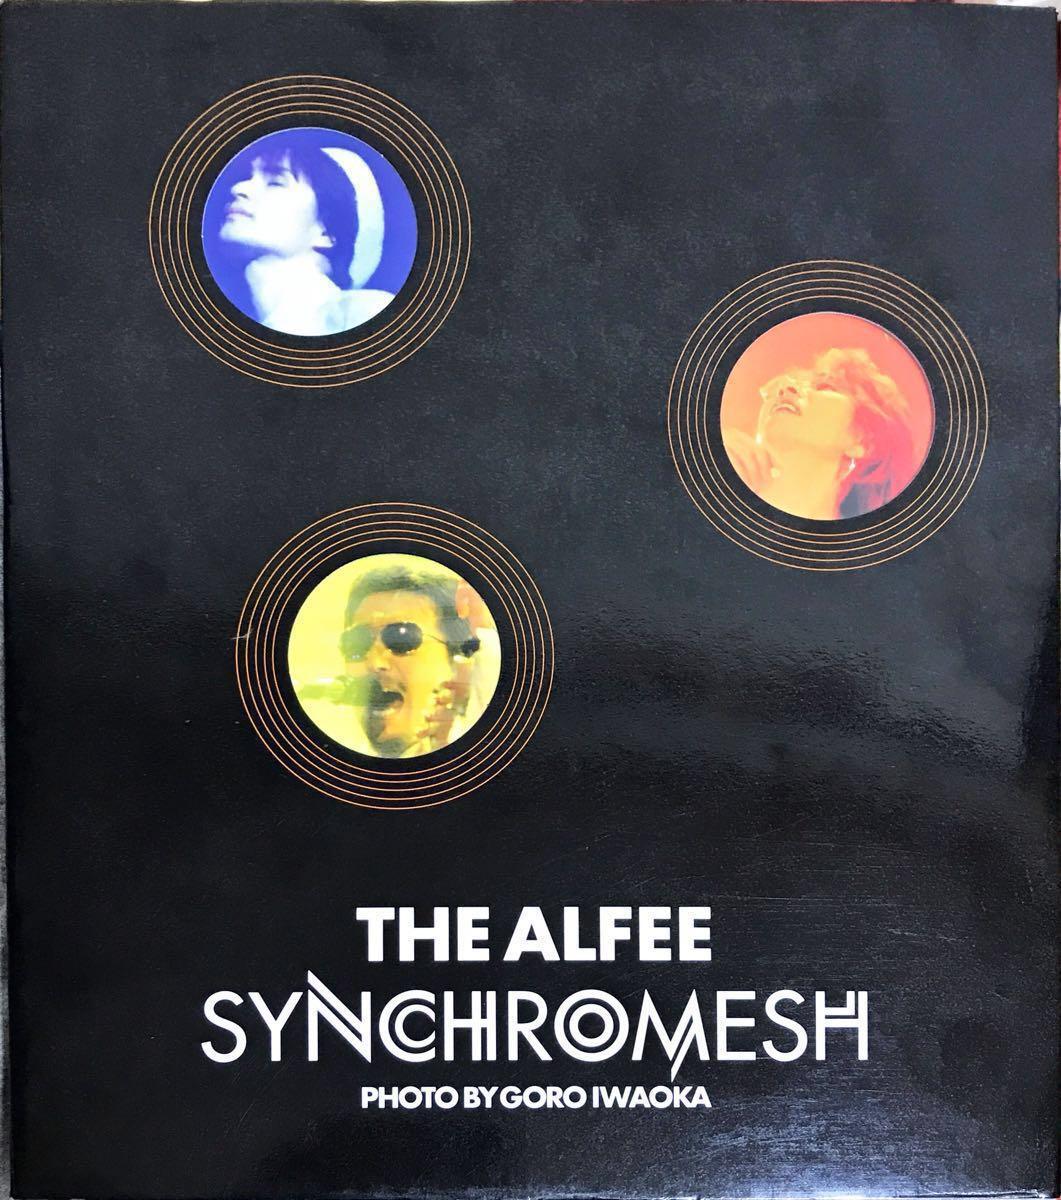 THE ALFEE SYNCHROMESH 写真集 TOKYO FM出版 定価3,500円 中古♪ THE アルフィー PHOTO Live ライブ